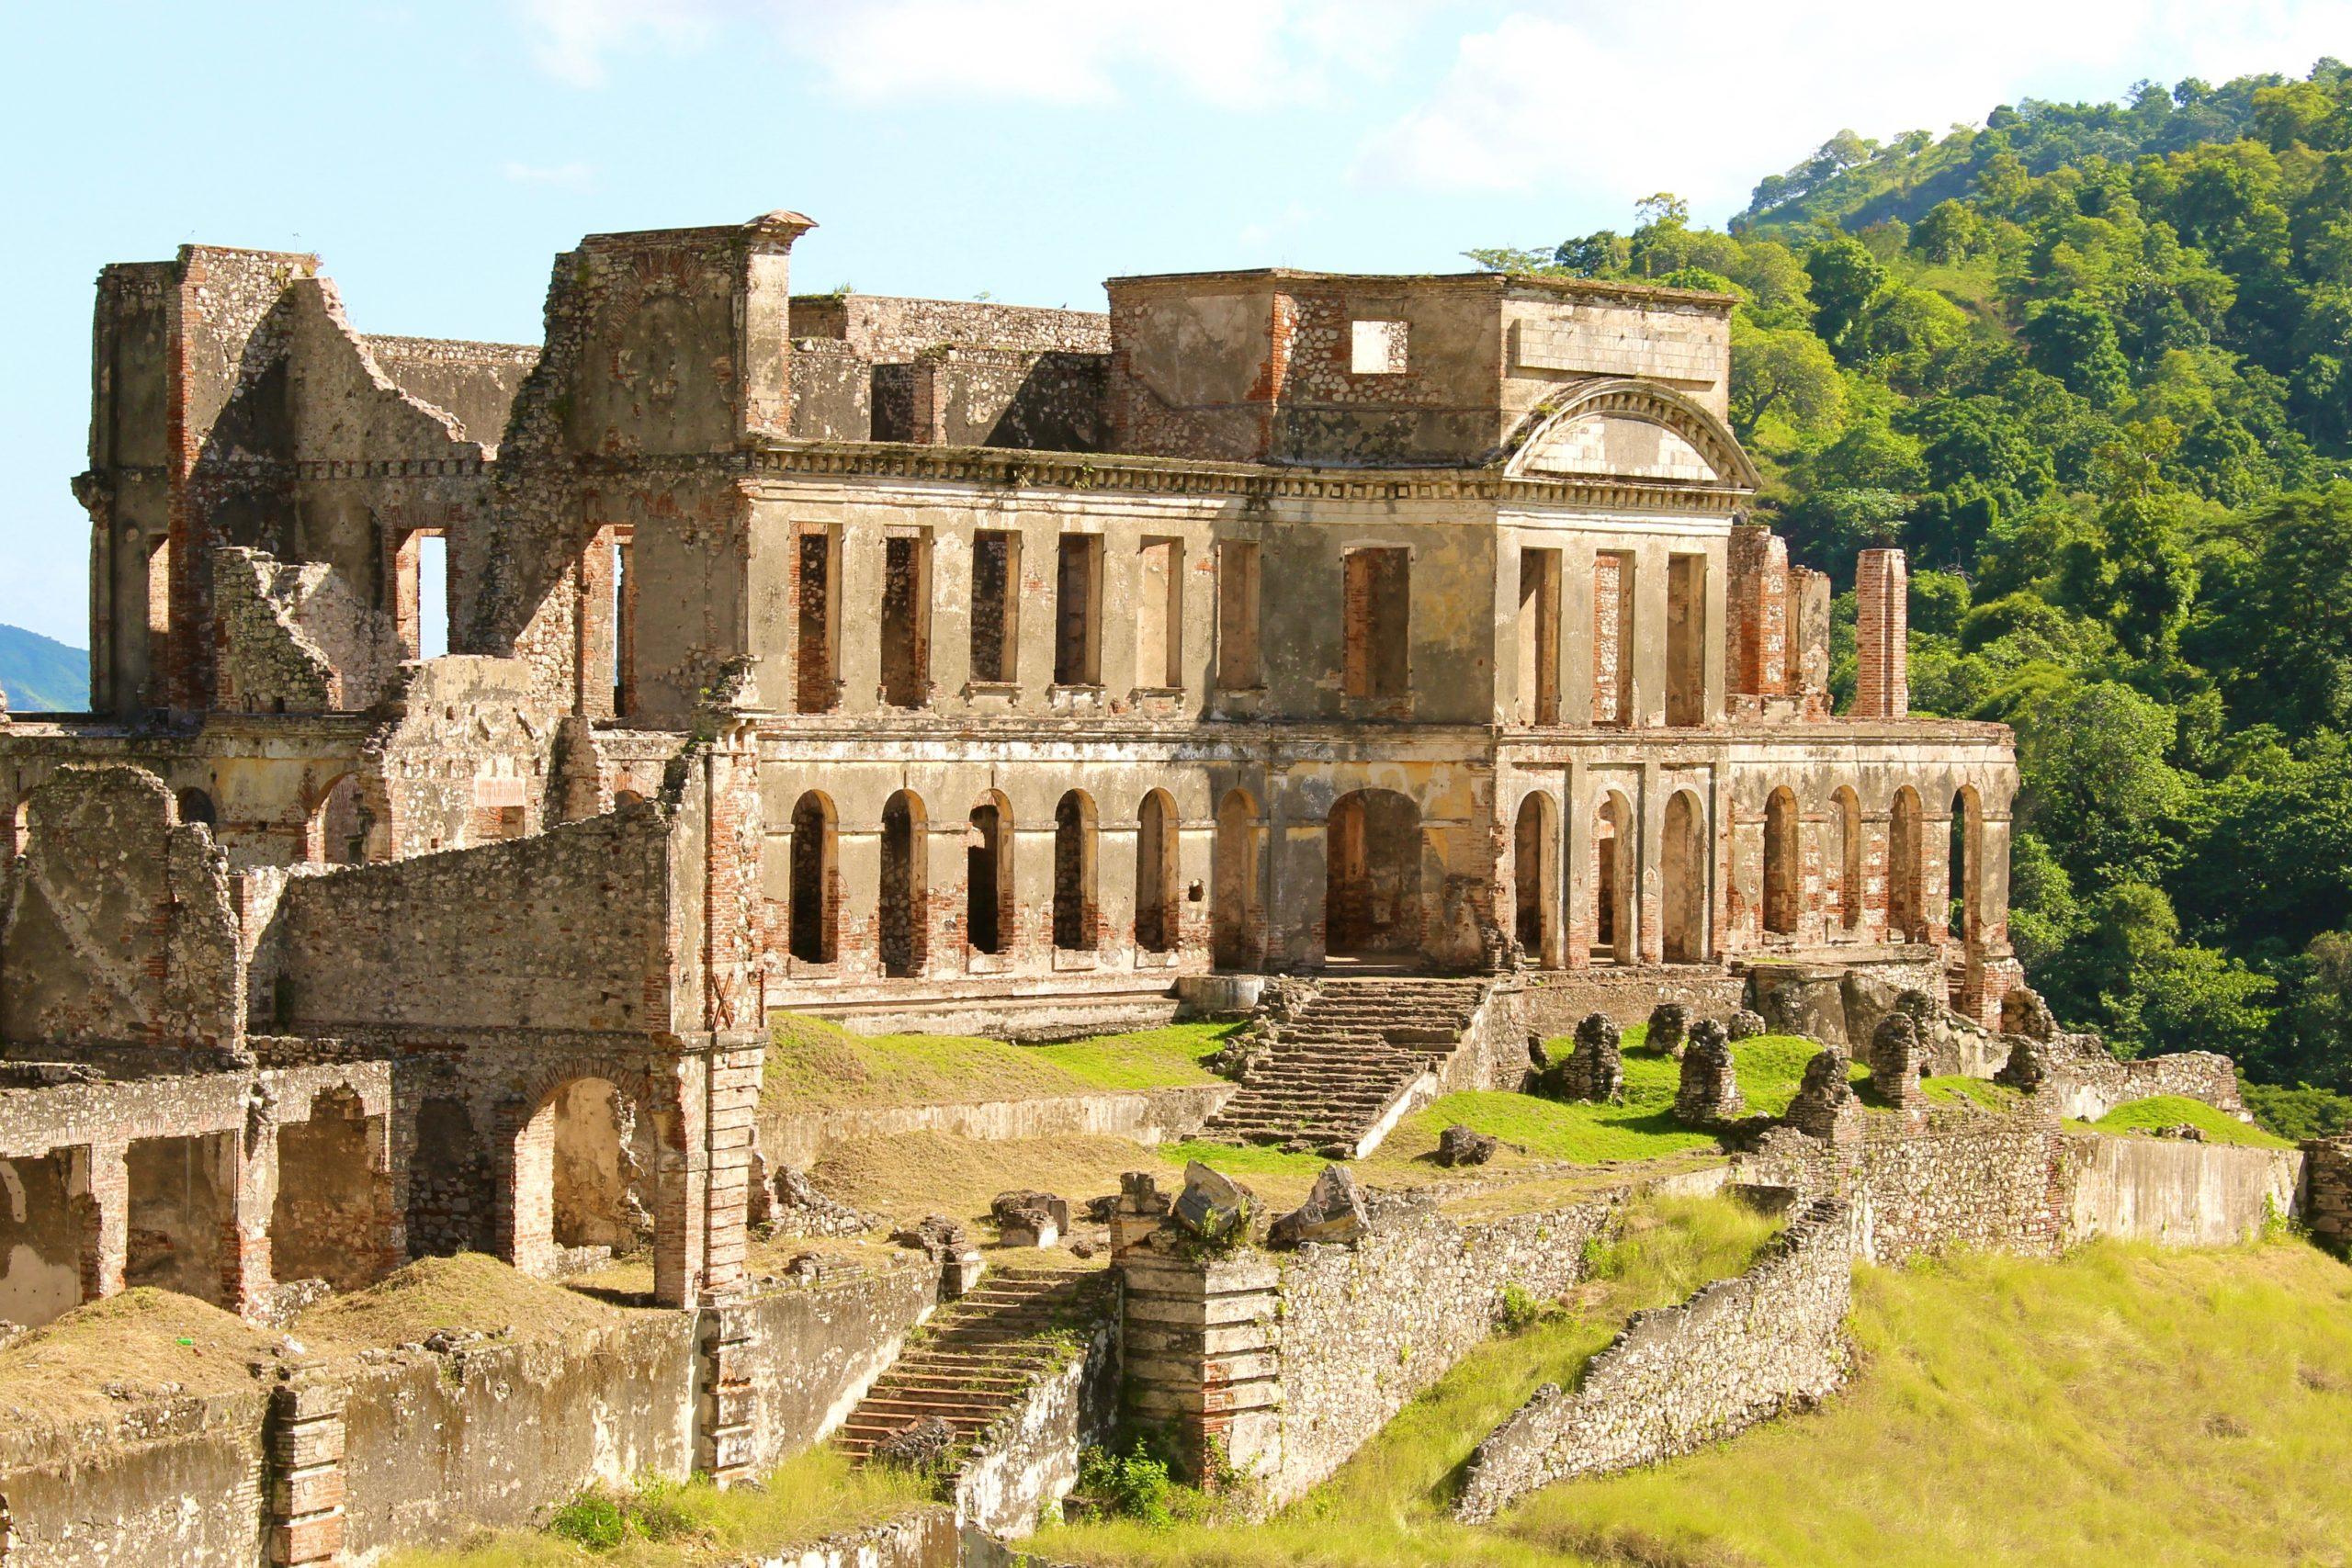 Sans-Souci Palace, National History Park